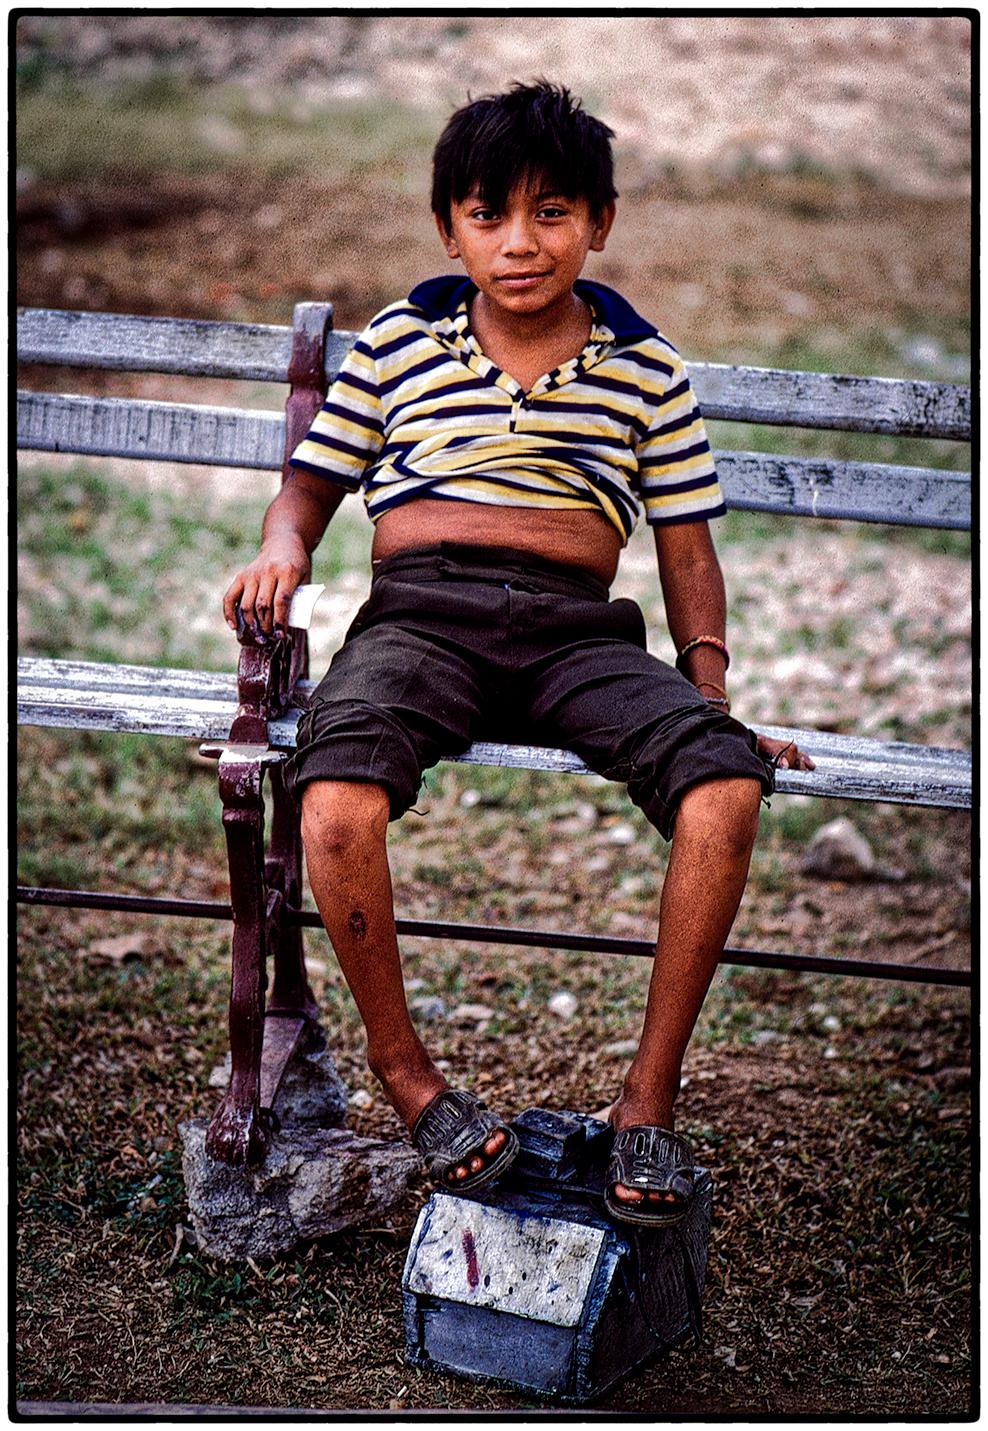 Shoeshine Boy, Mexico 1994